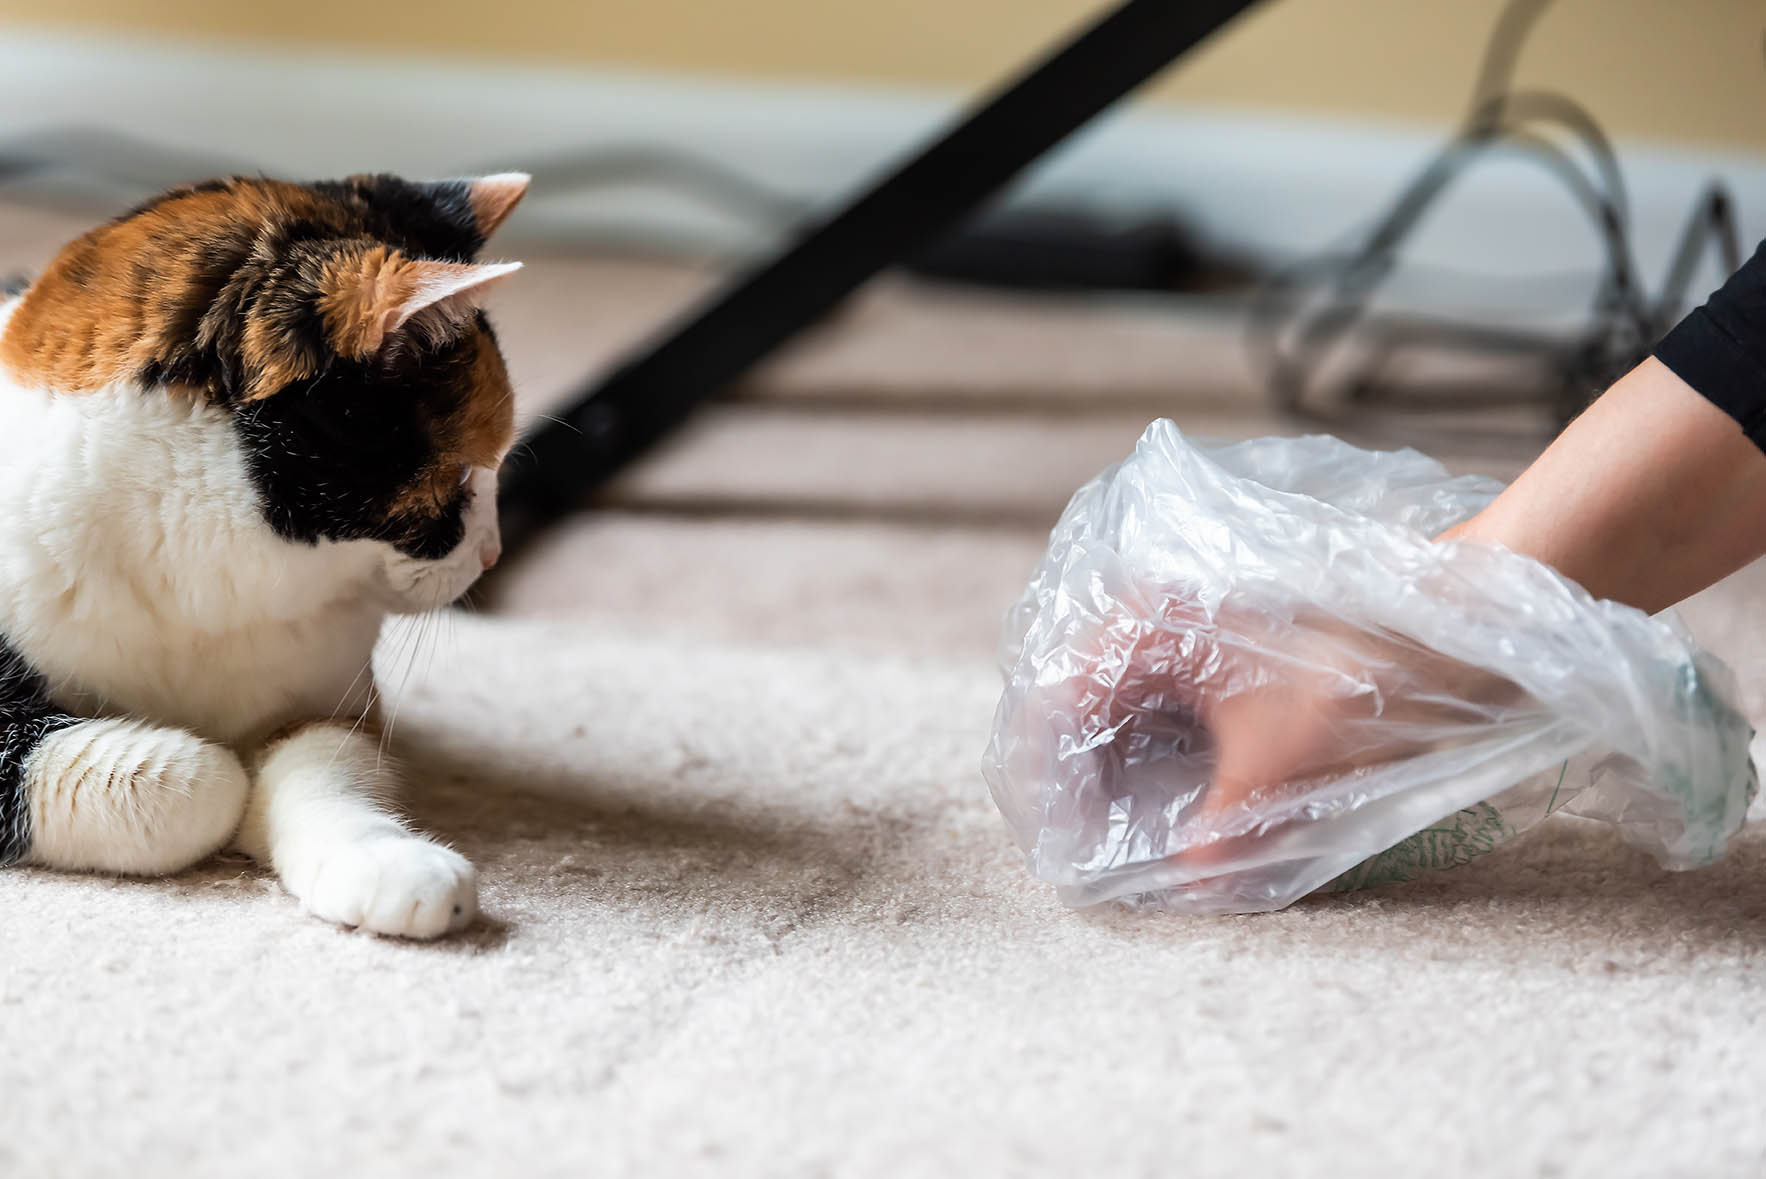 hand picking up cat poop